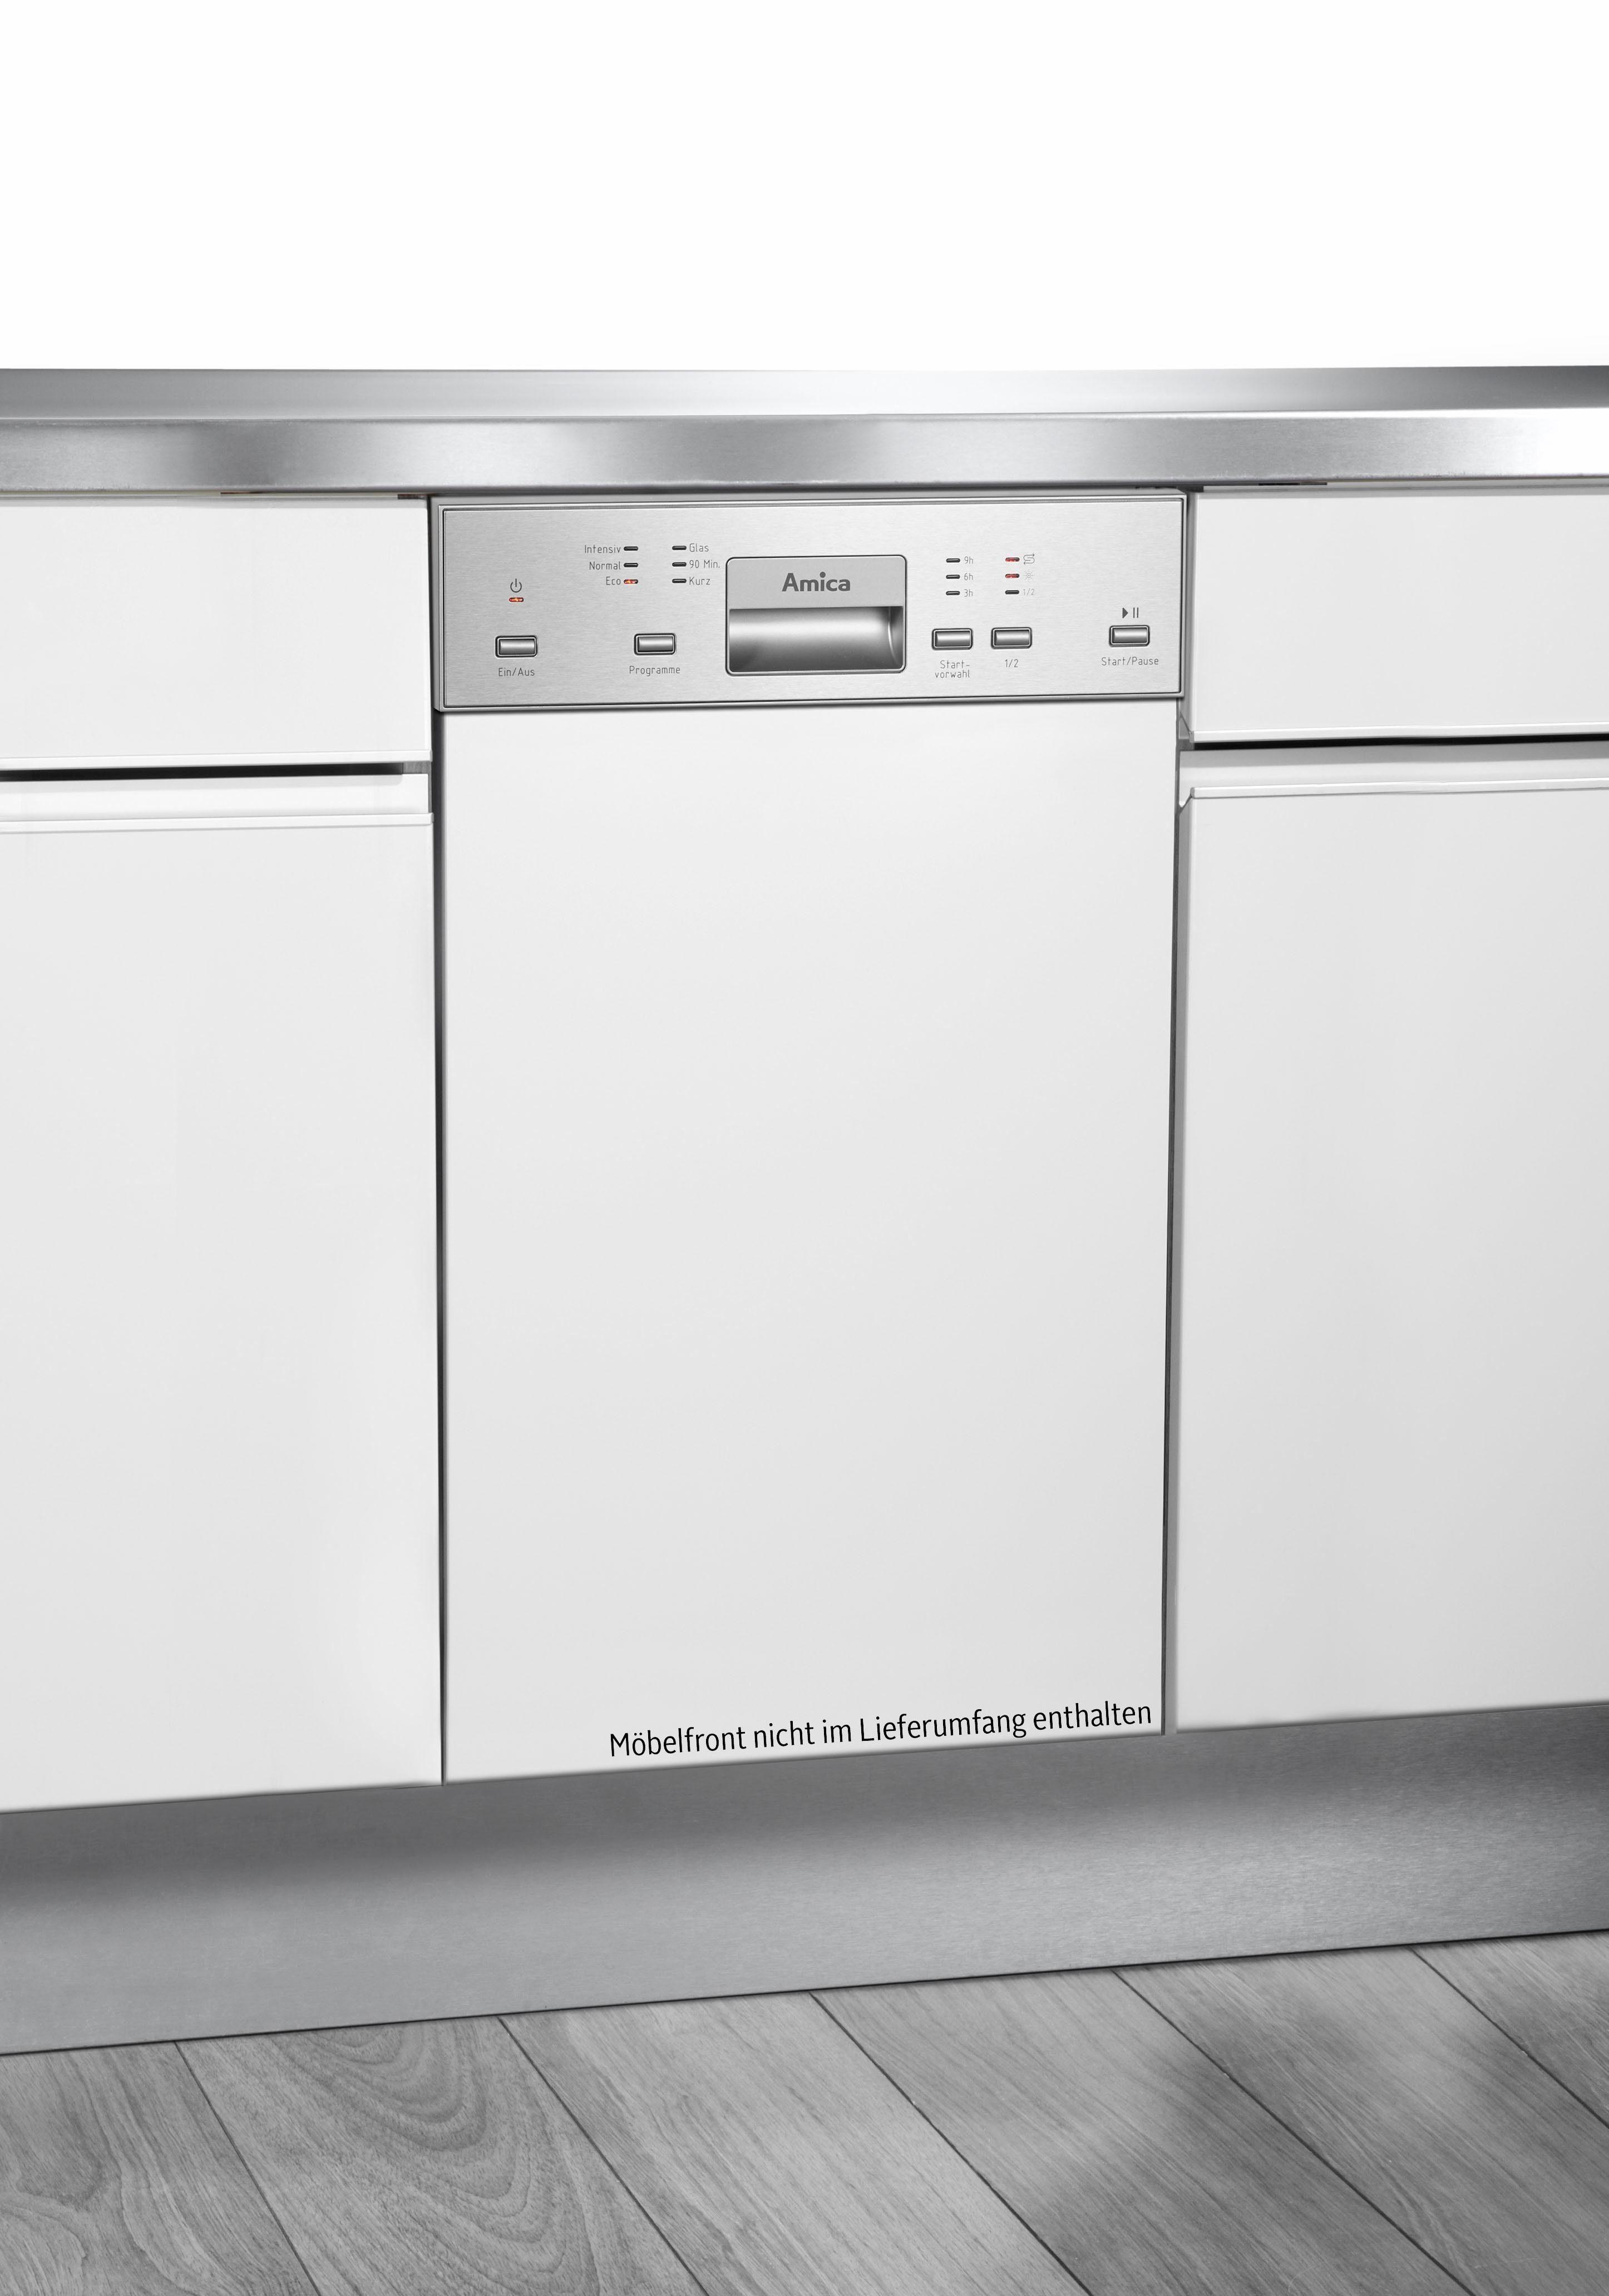 Amica teilintegrierbarer Geschirrspüler, EGSP 14895 E, 9 l, 10 Maßgedecke, 45 cm breit